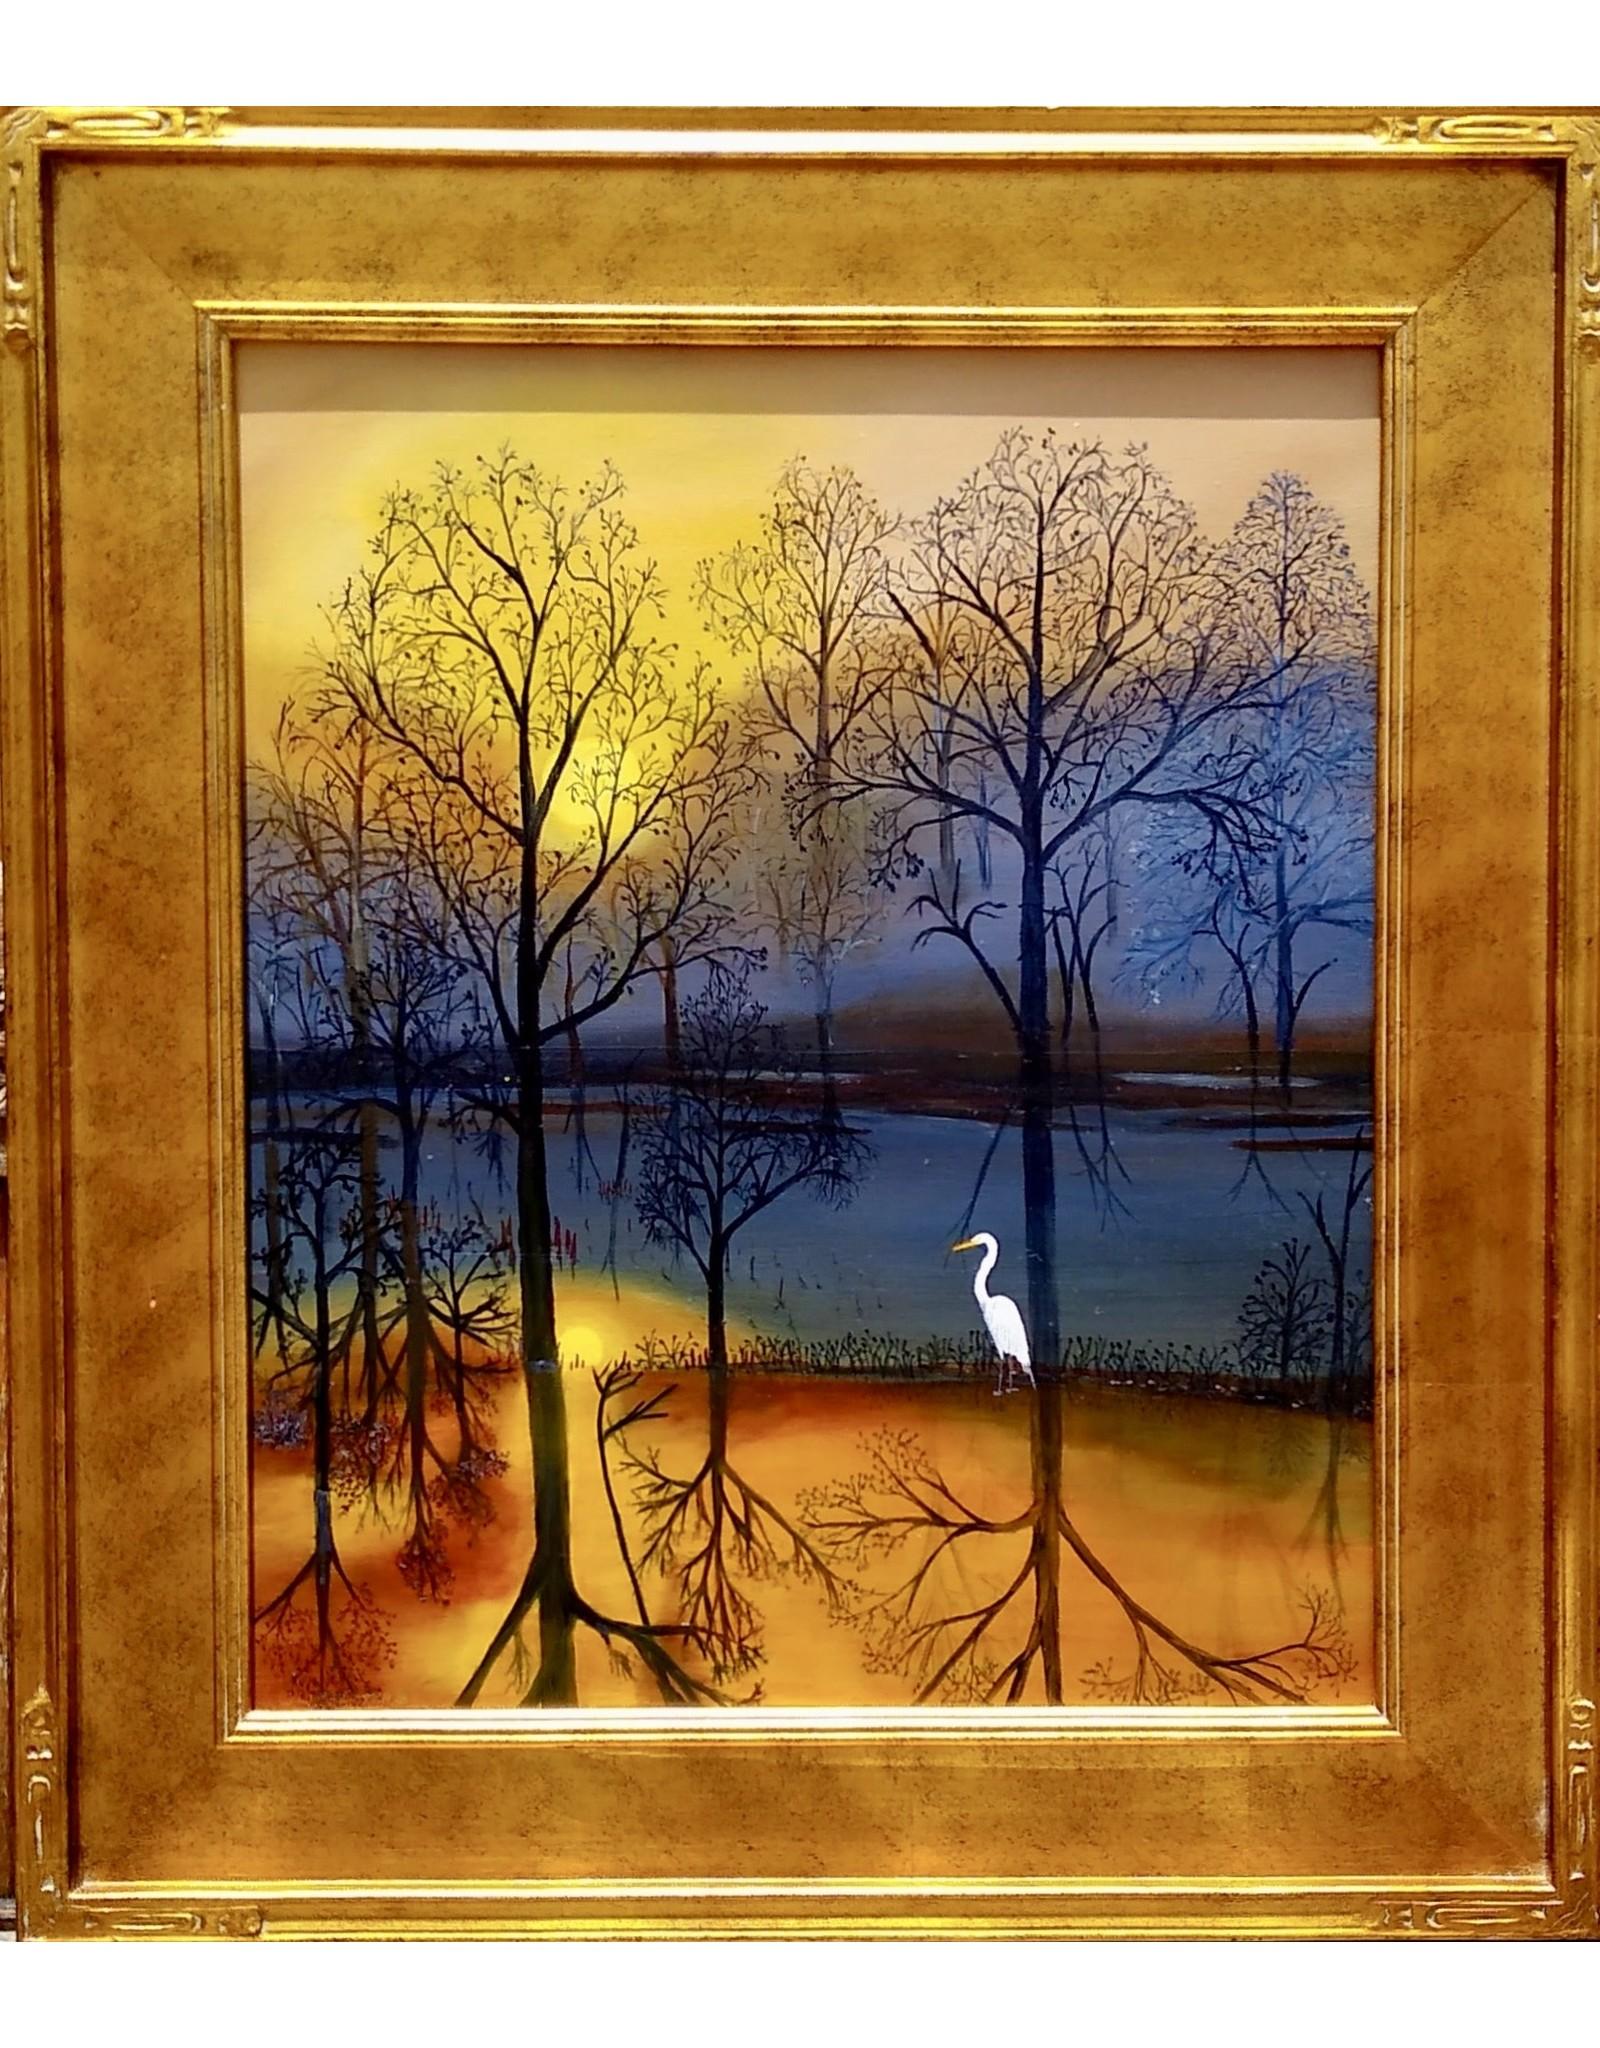 Cliff Potenza Good Morning Sunsnhine (Original Oil, 20x24)